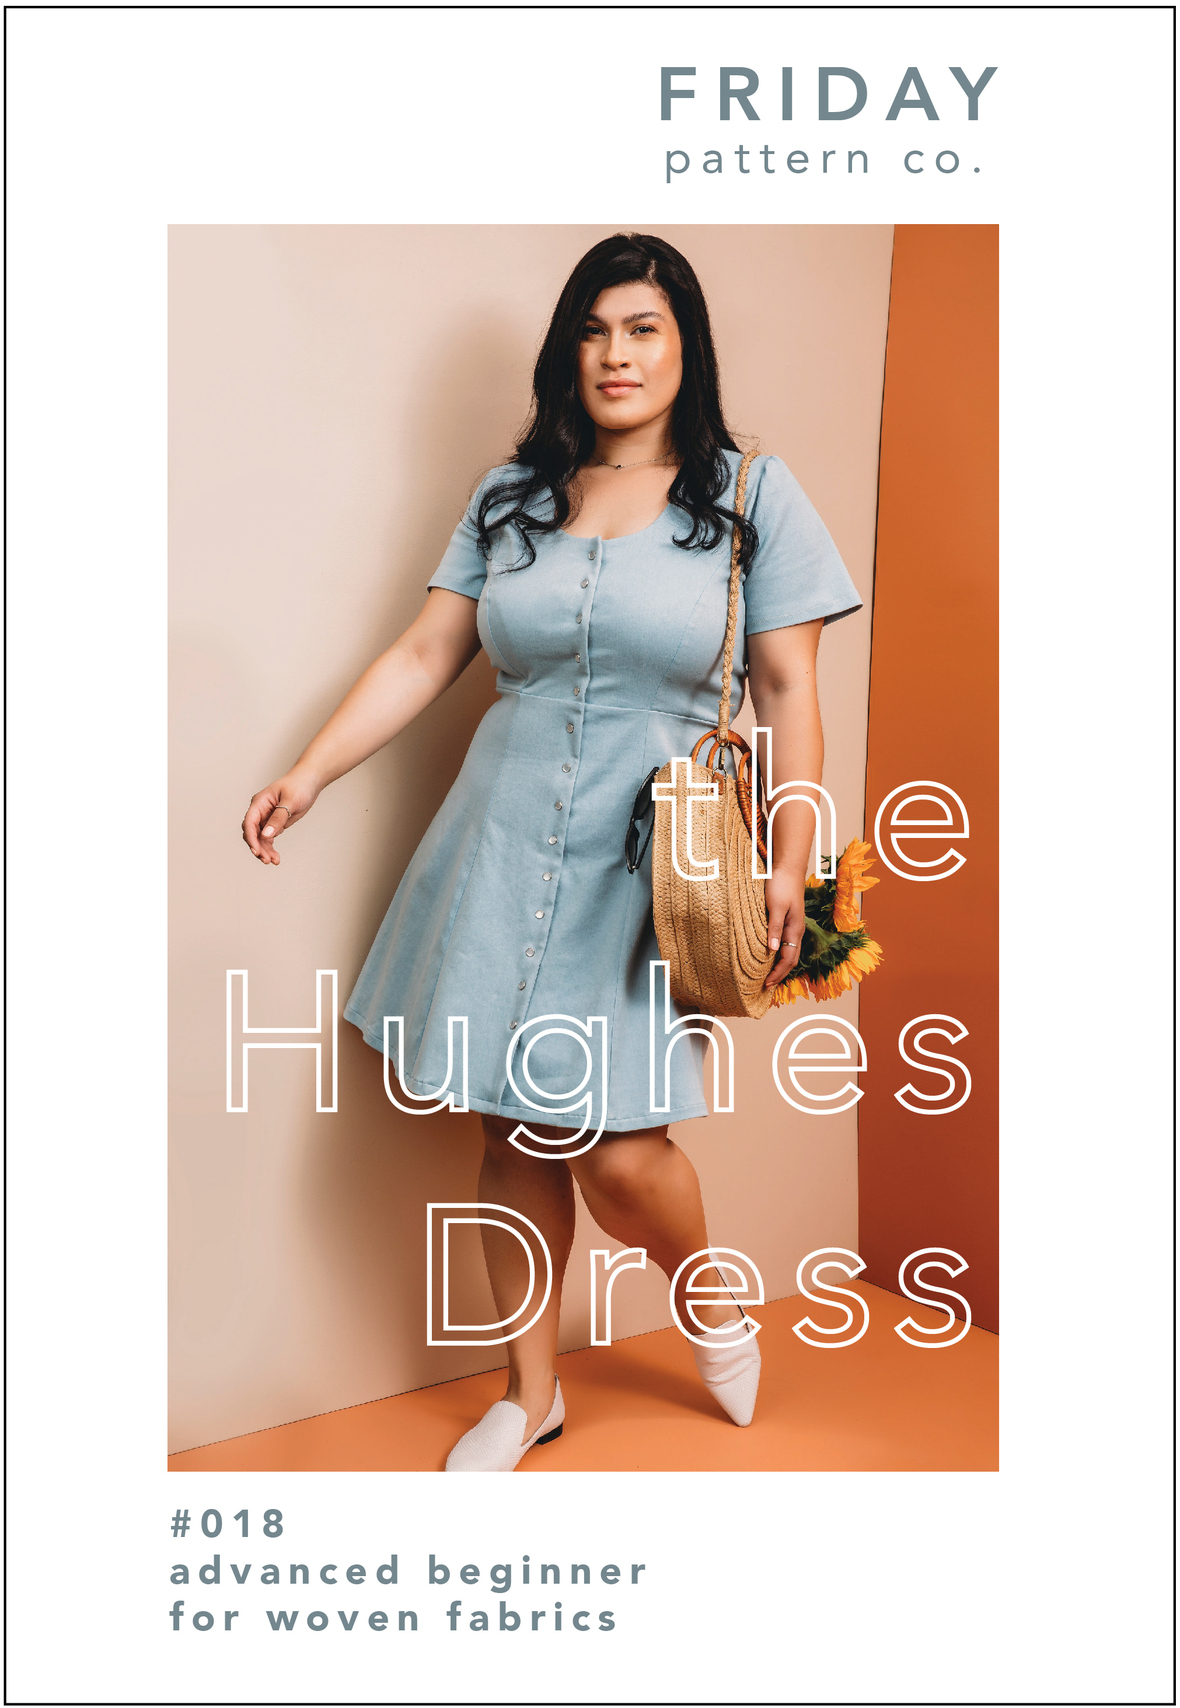 Hughes Dress Front